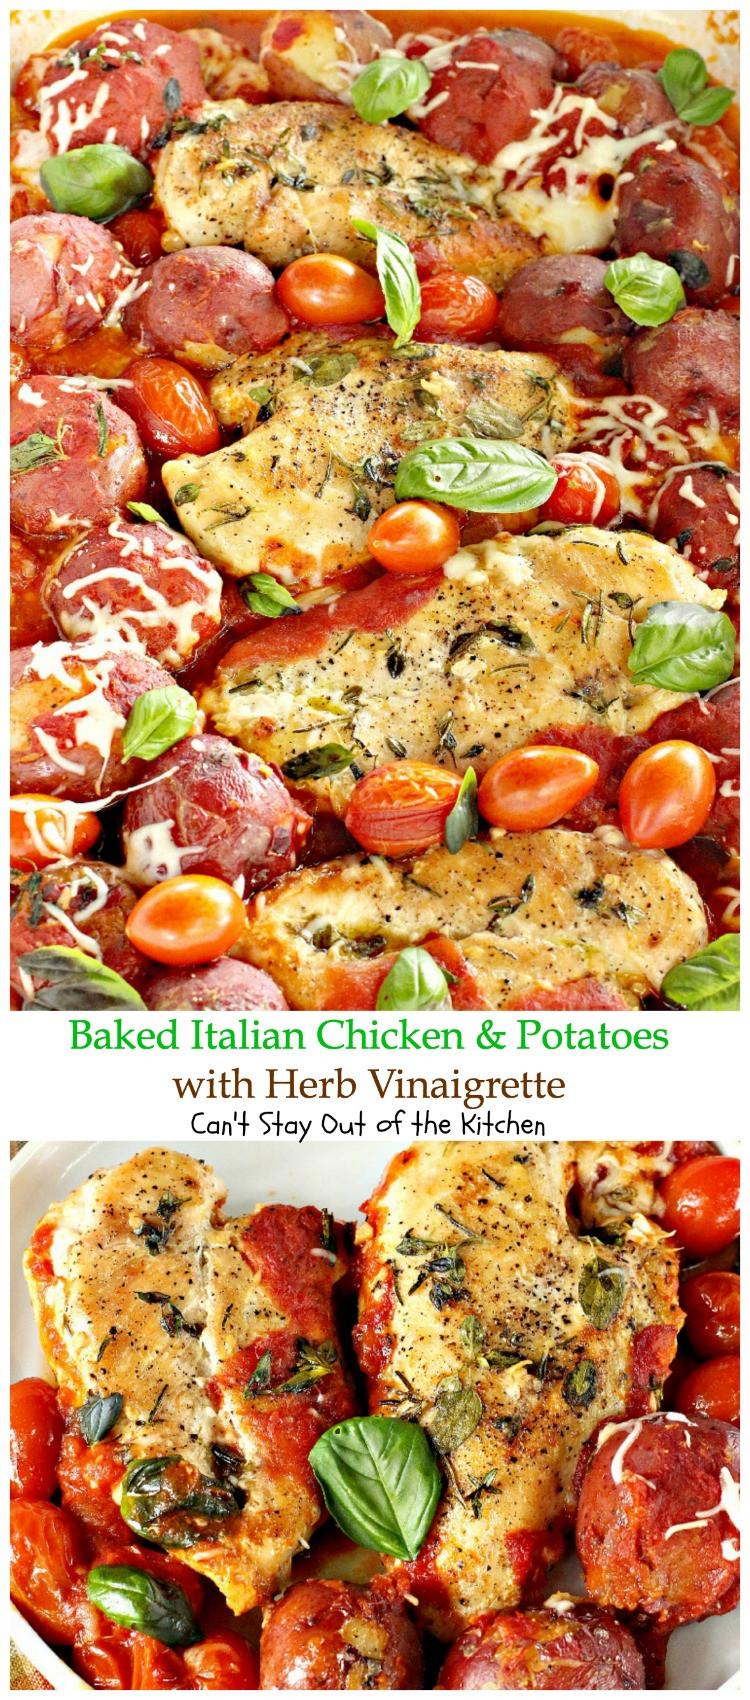 Baked Italian Chicken  Baked Italian Chicken and Potatoes with Herb Vinaigrette